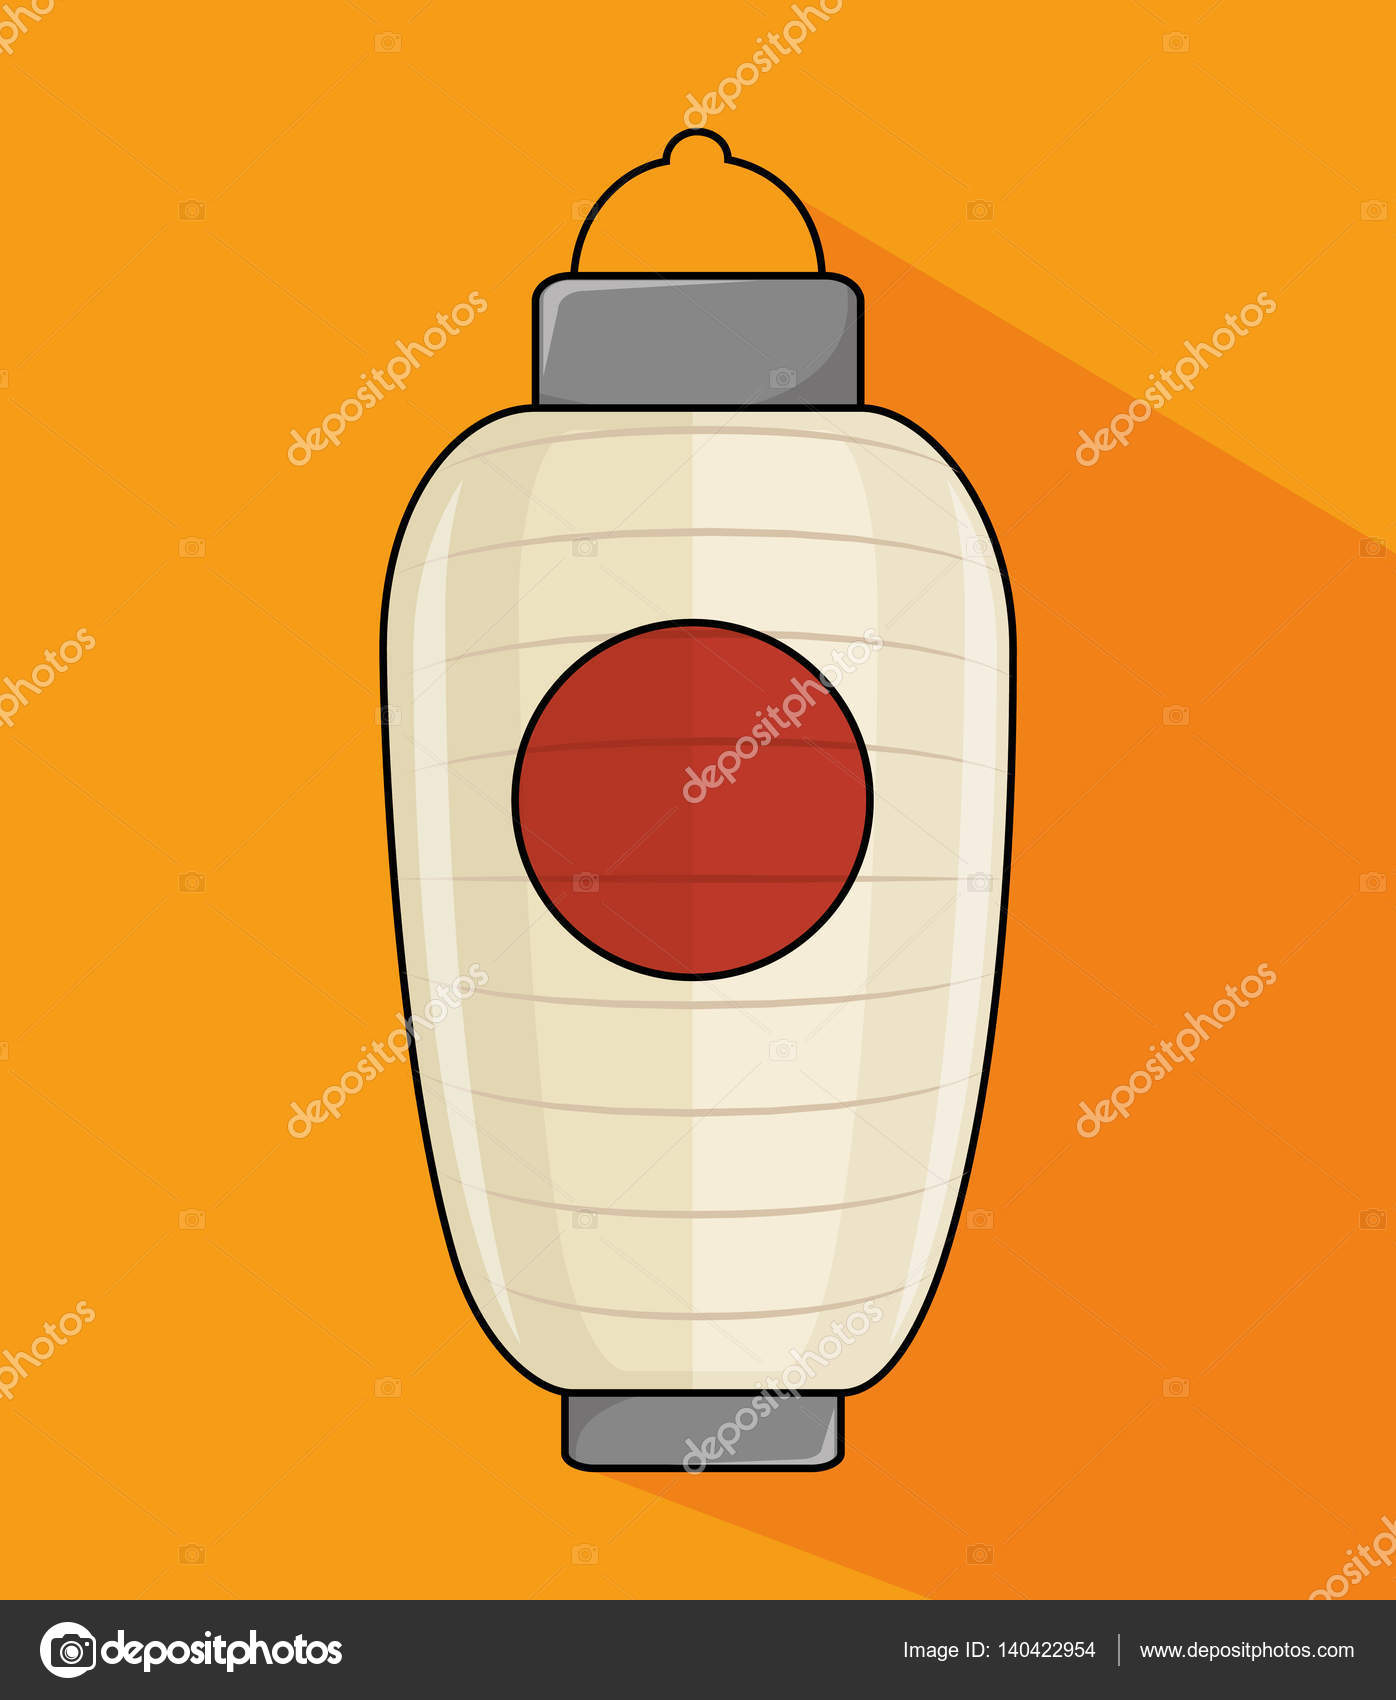 Latern clipart japan culture Culture Vector yupiramos lantern —